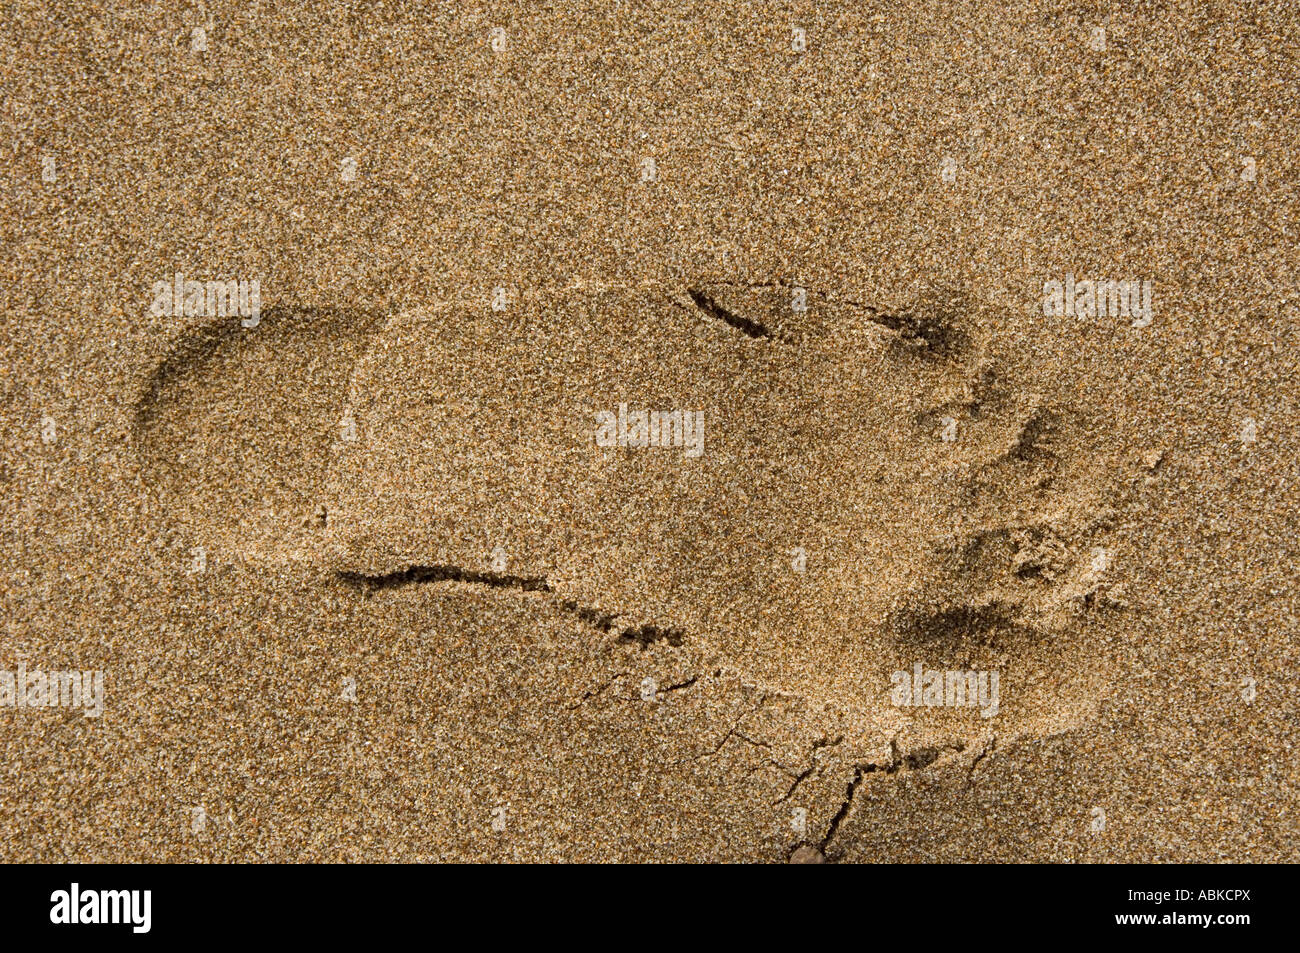 left foot footprint in yellow golden sand - Stock Image